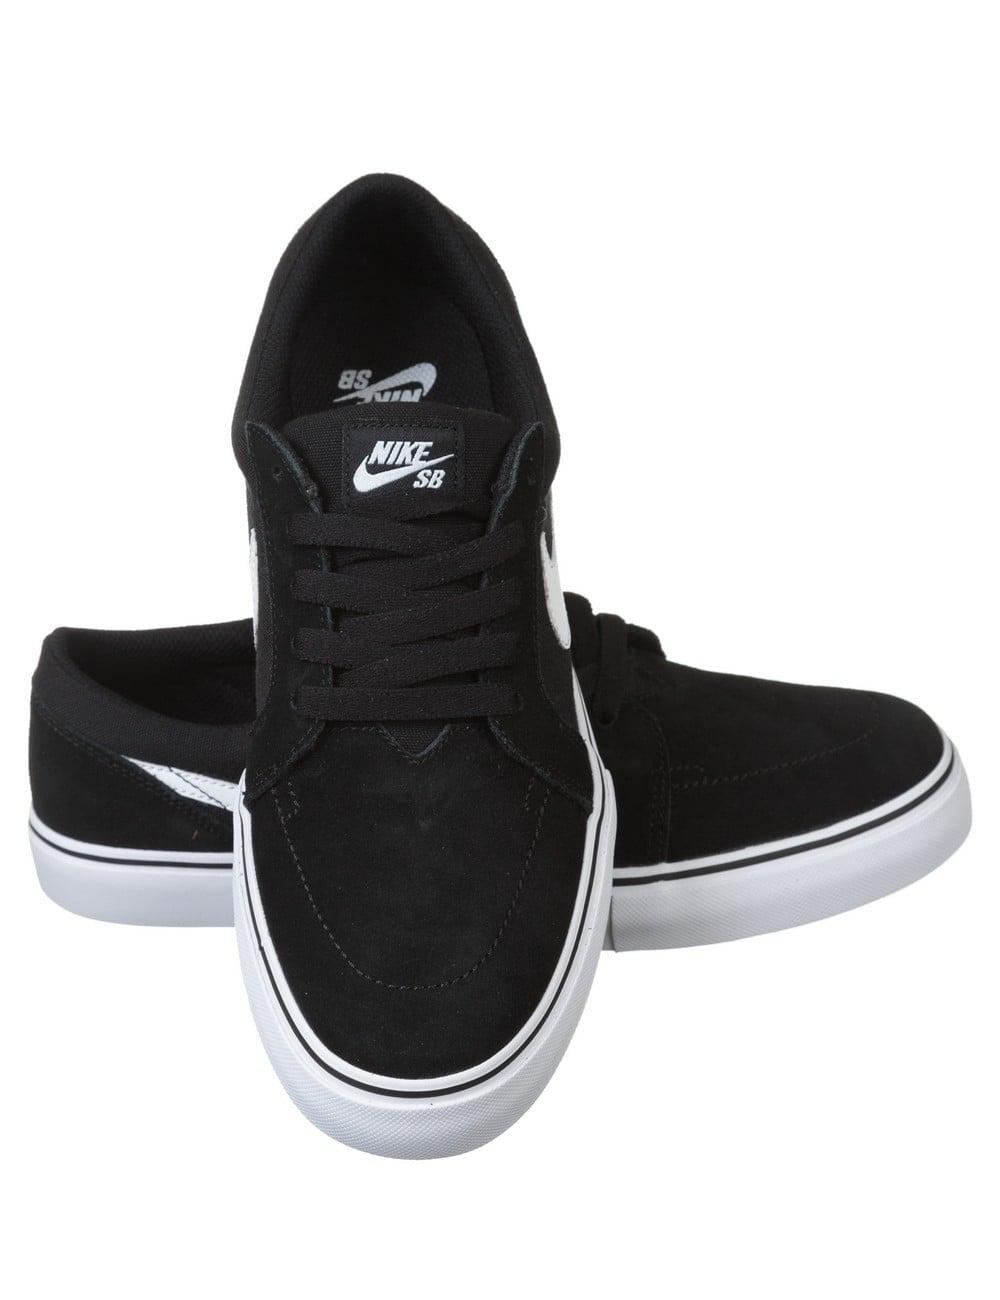 Nike Sb Satire Ii Shoes Black White Footwear From Fat Buddha